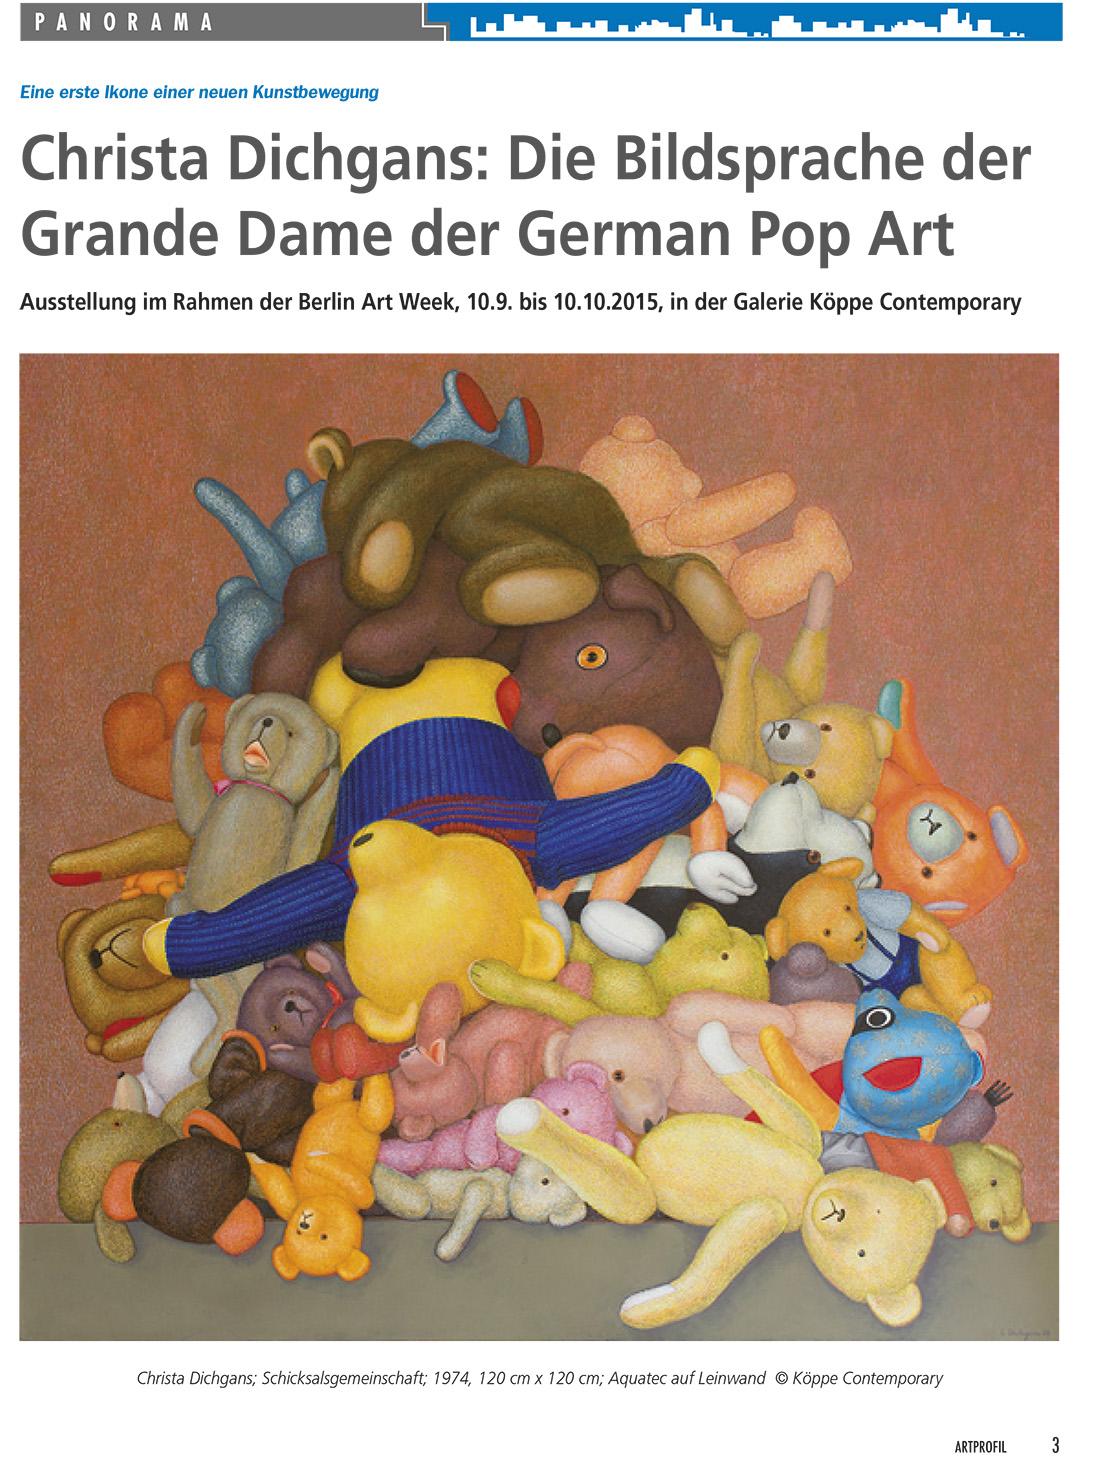 Christa Dichgans - Art Profil 110 / 2015